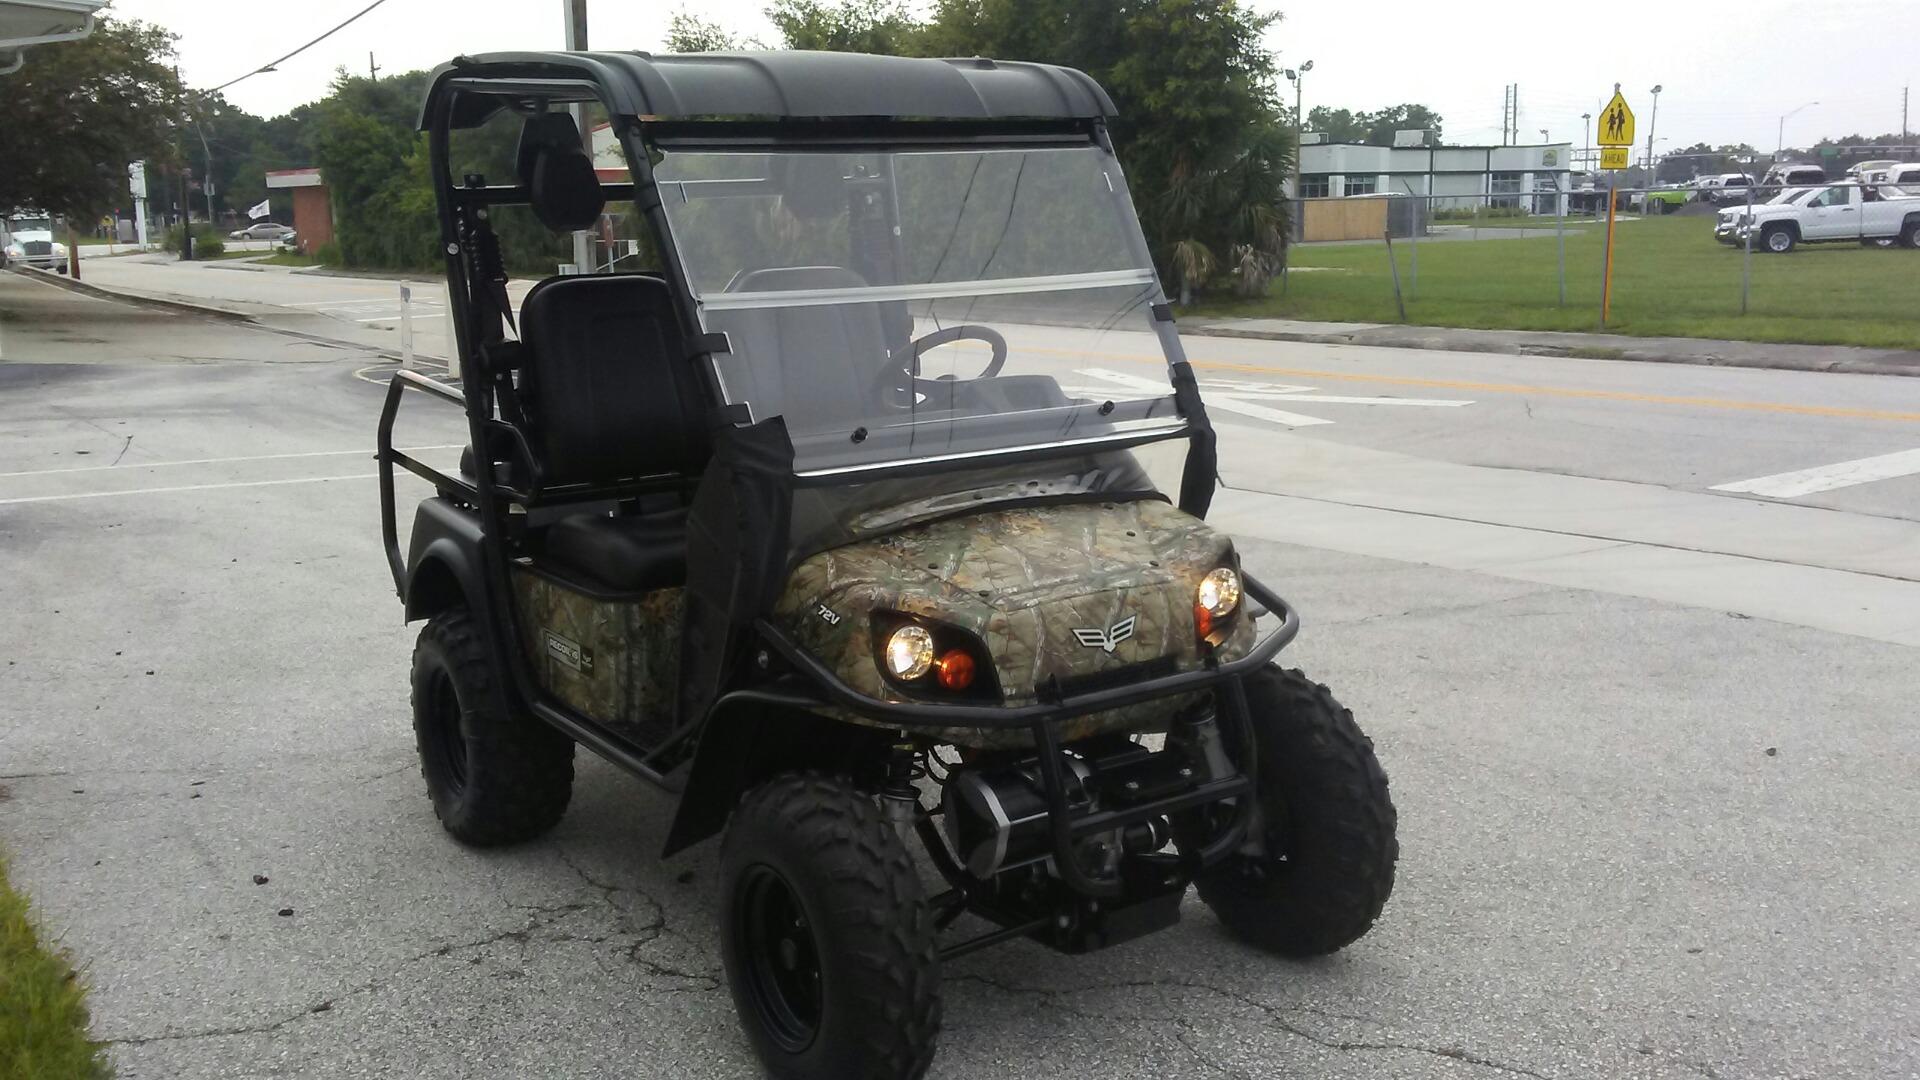 Atv Dealer Lakeland Fl >> ATVs and UTVs For Sale